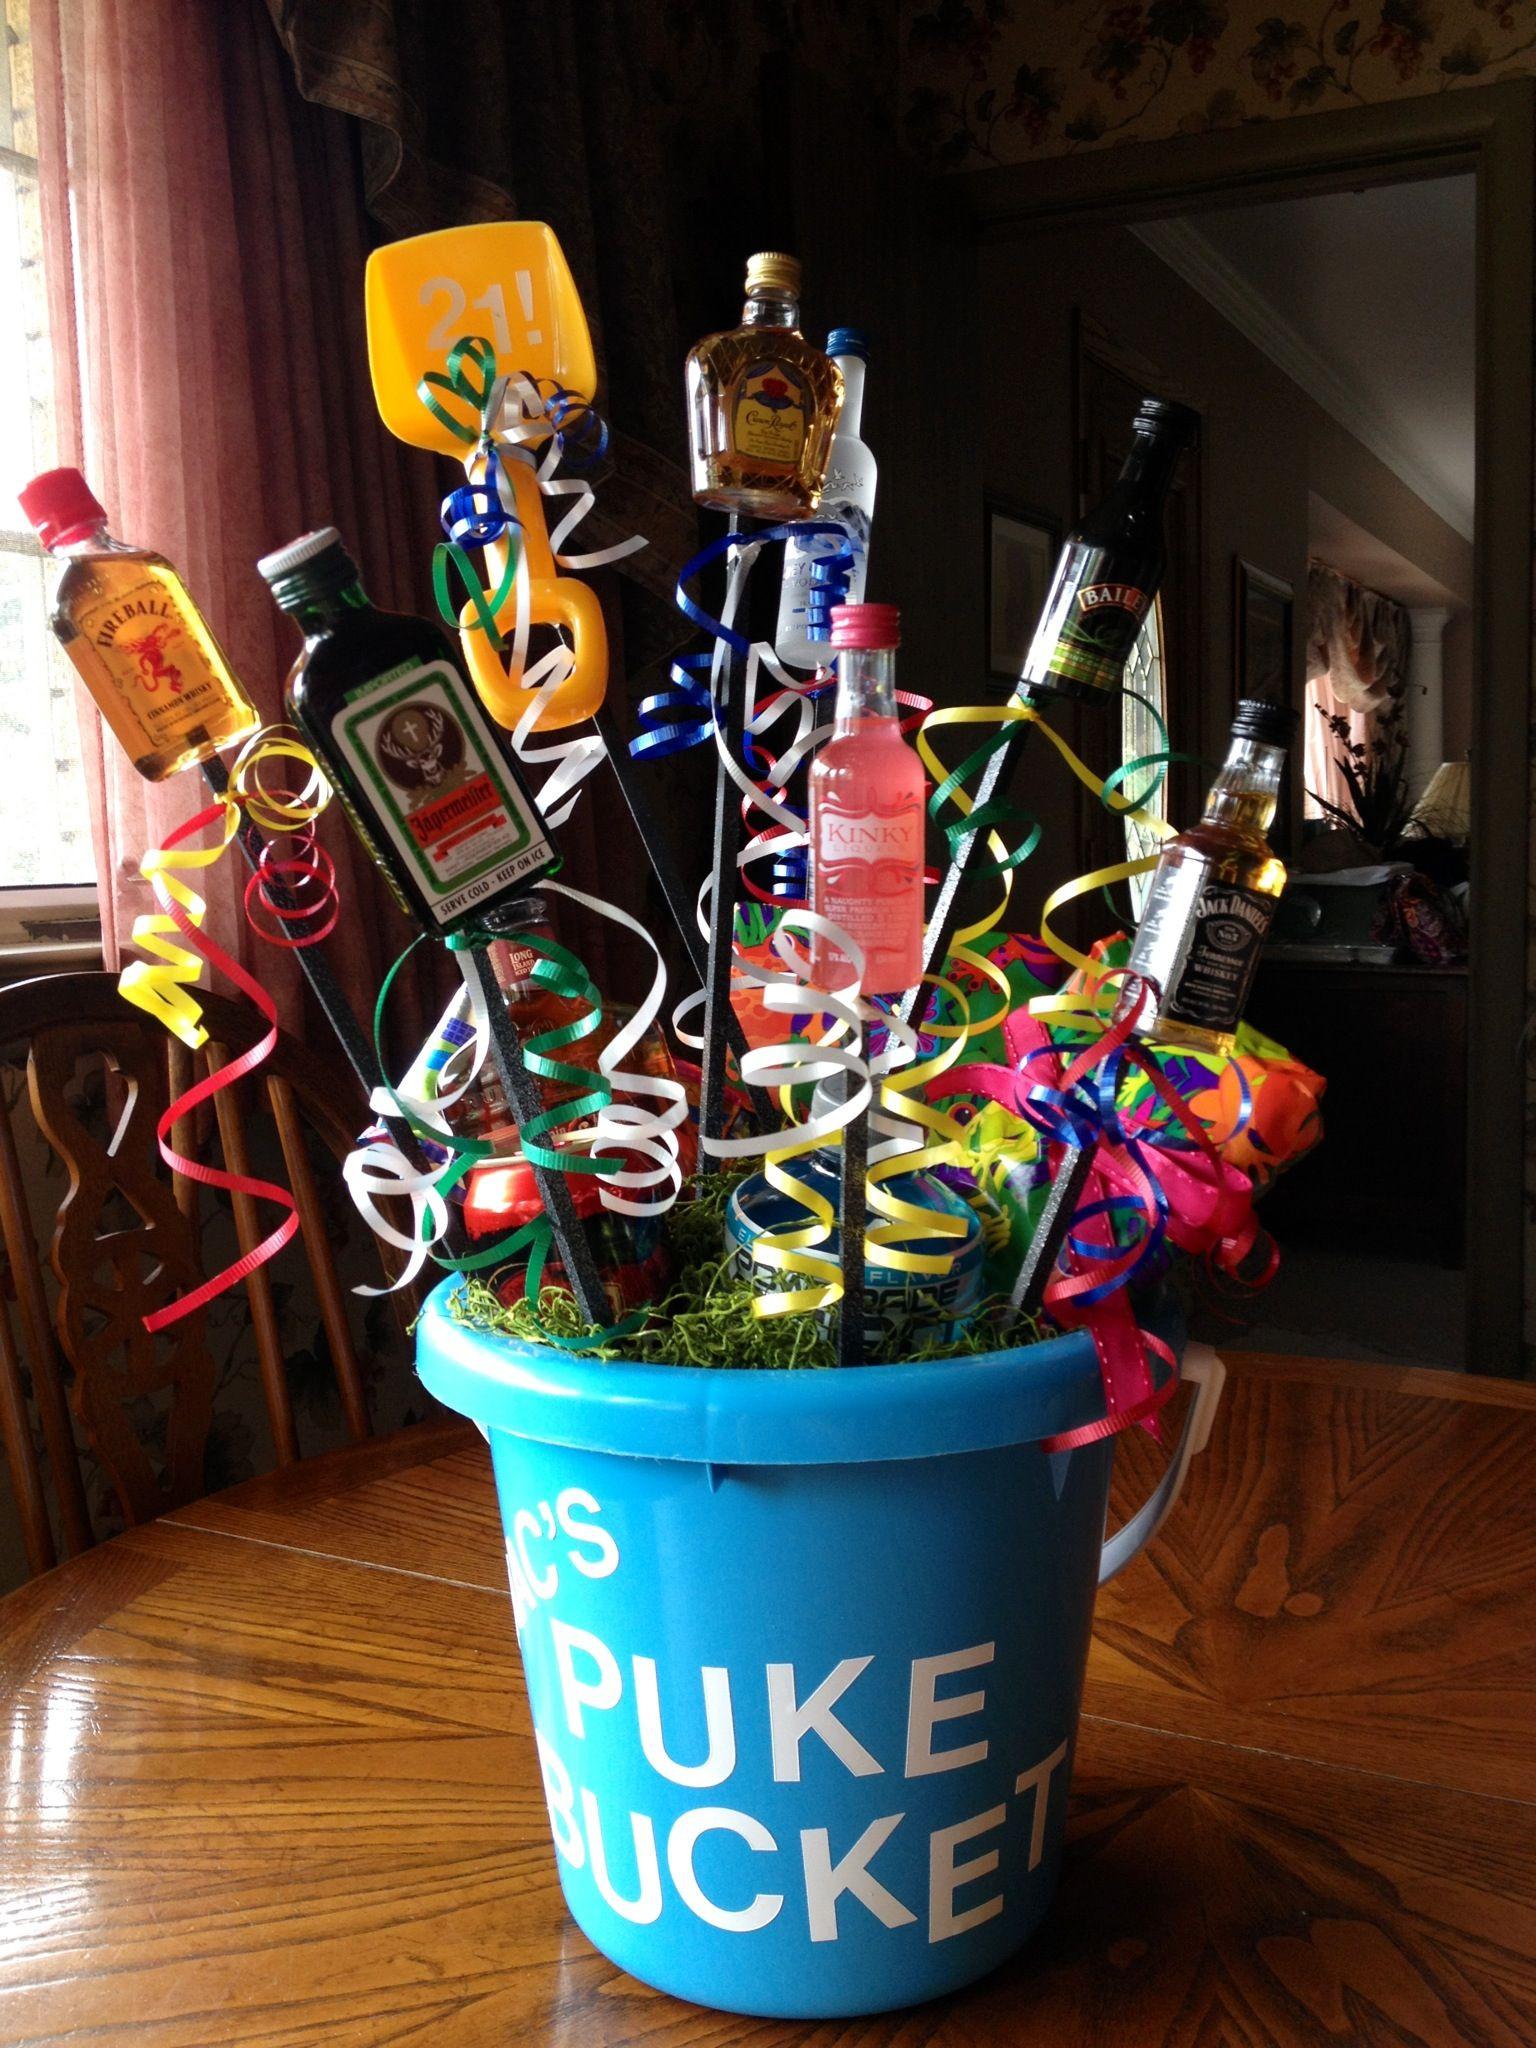 Best ideas about 21St Birthday Gift Ideas . Save or Pin Boyfriend s 21st Birthday present Gift Ideas Now.